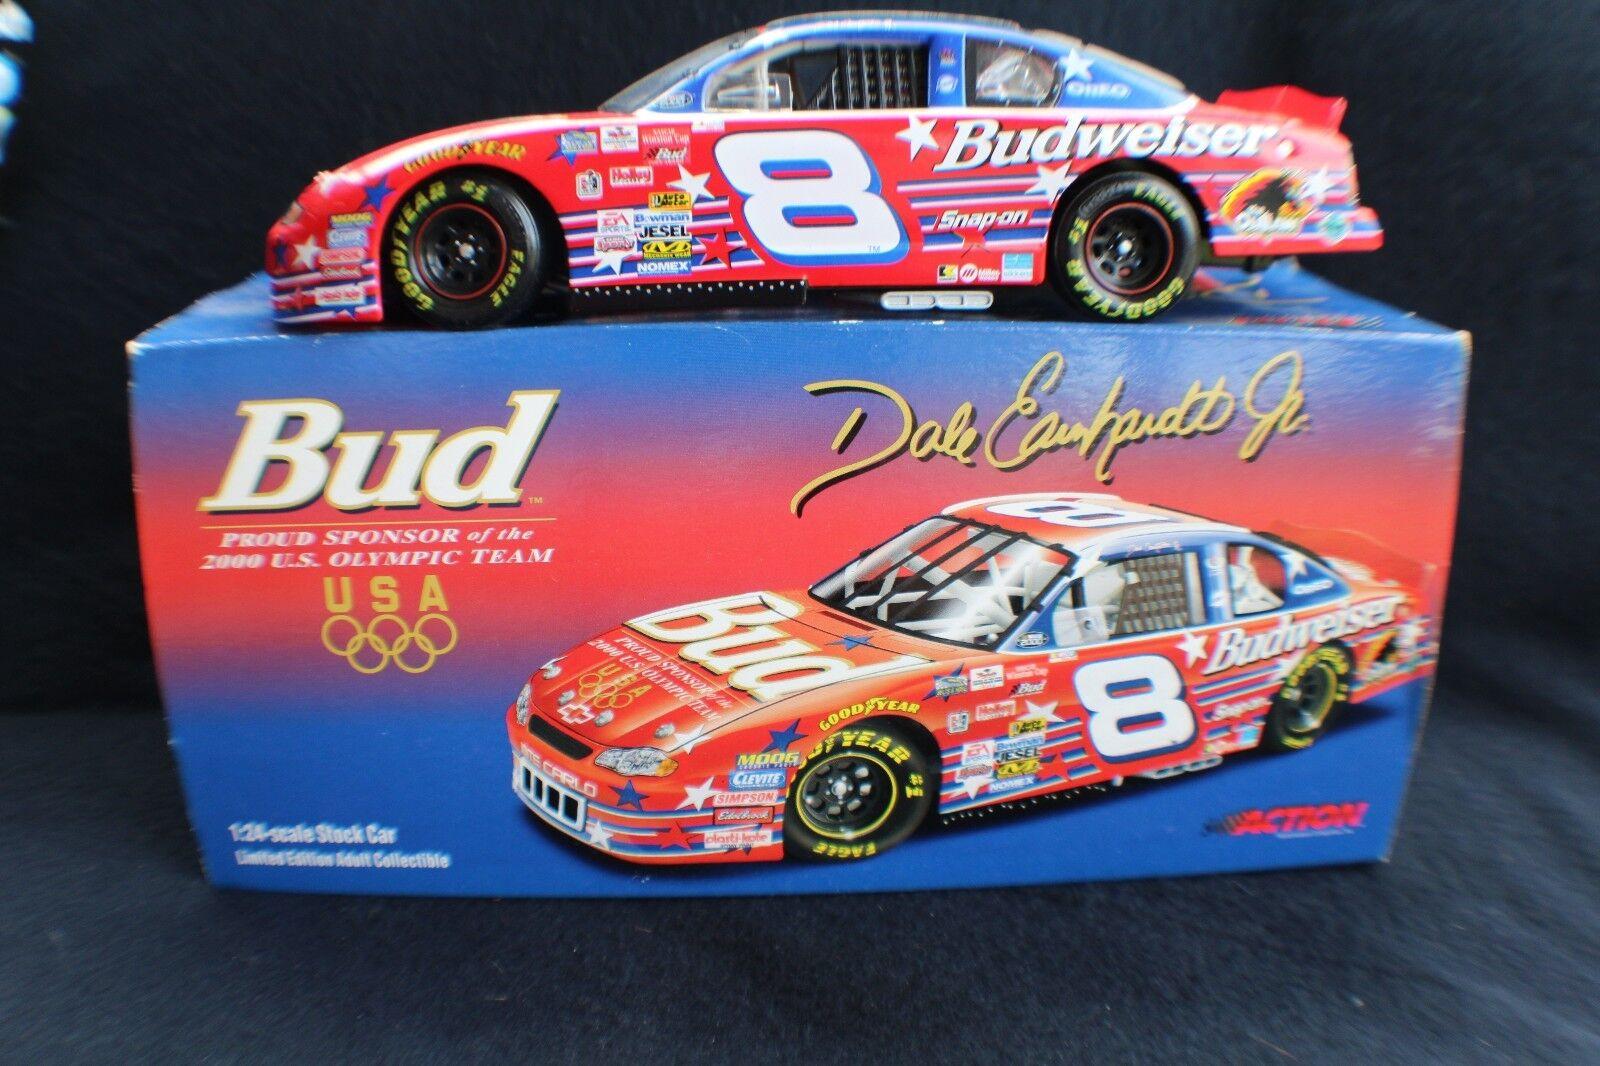 Dale Earnhardt Jr Budweiser US Olympic Team 1 24car,  of 7500 made